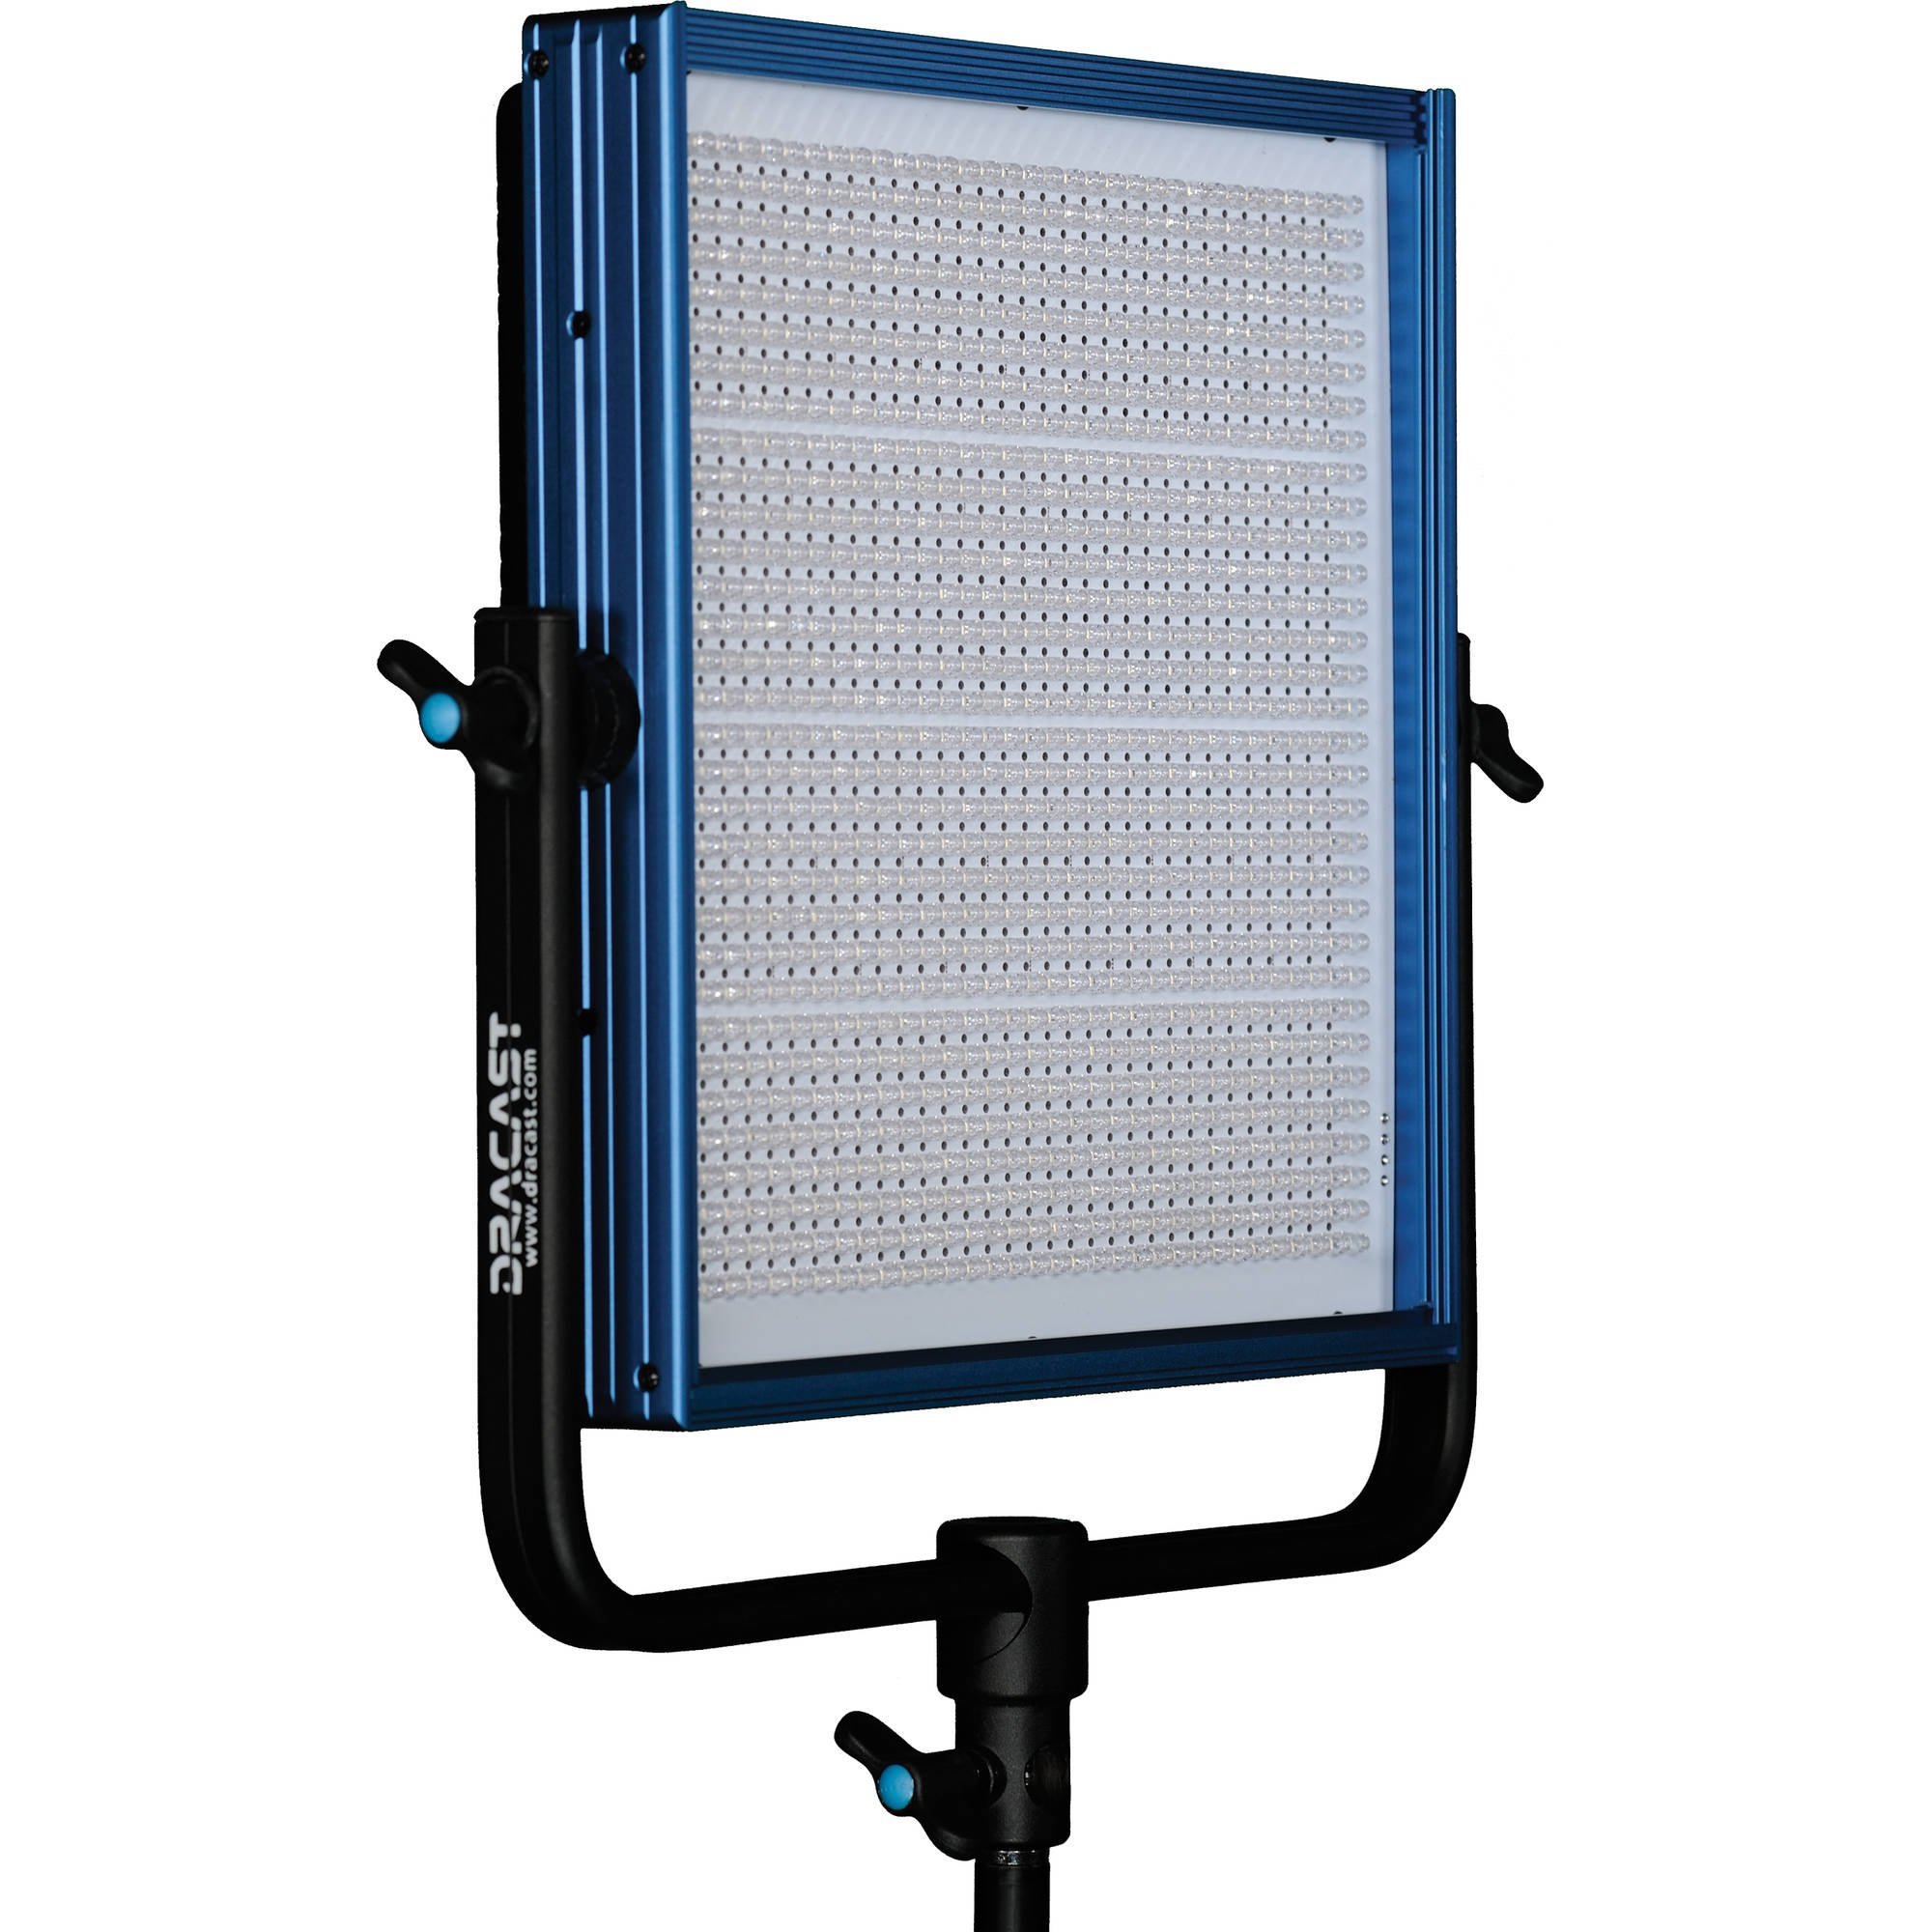 Dracast LED1000 Plus Series Daylight Panel